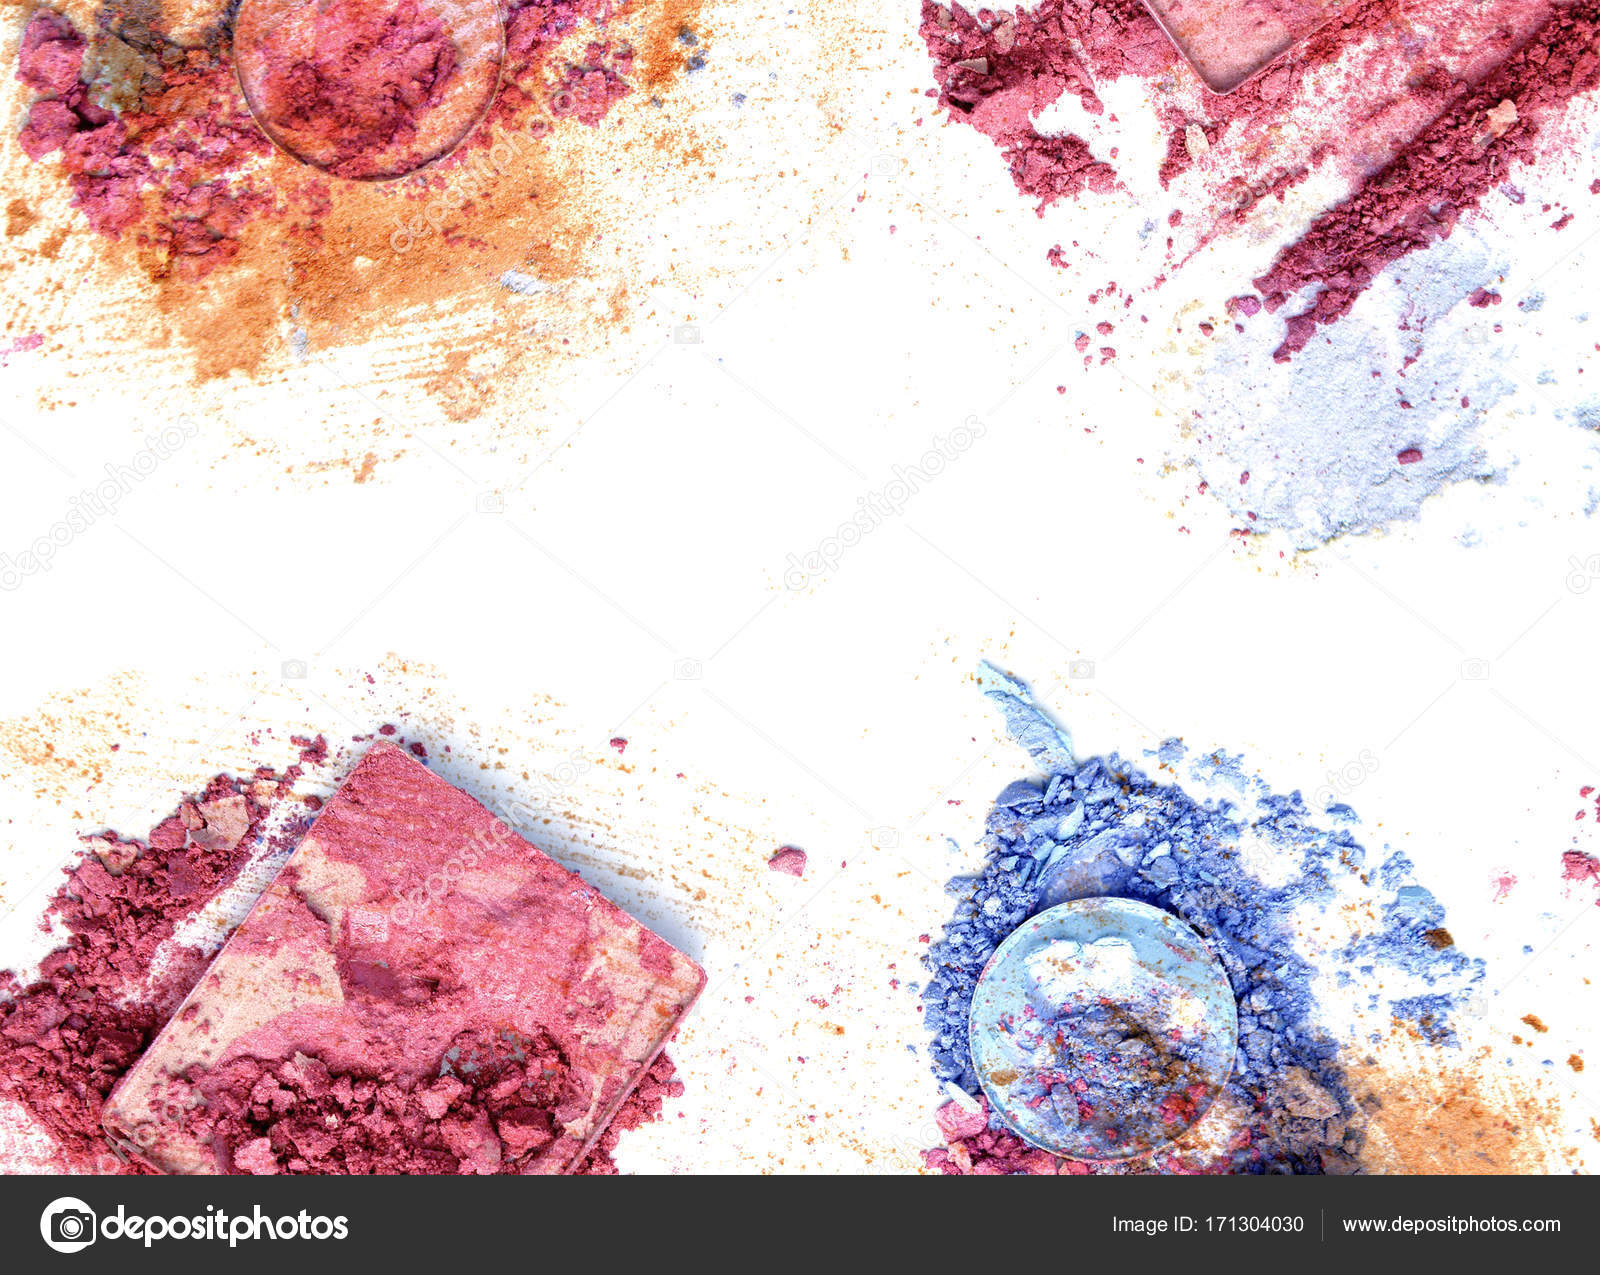 Marco maquillaje color maquillaje sombra de ojos — Foto de stock ...